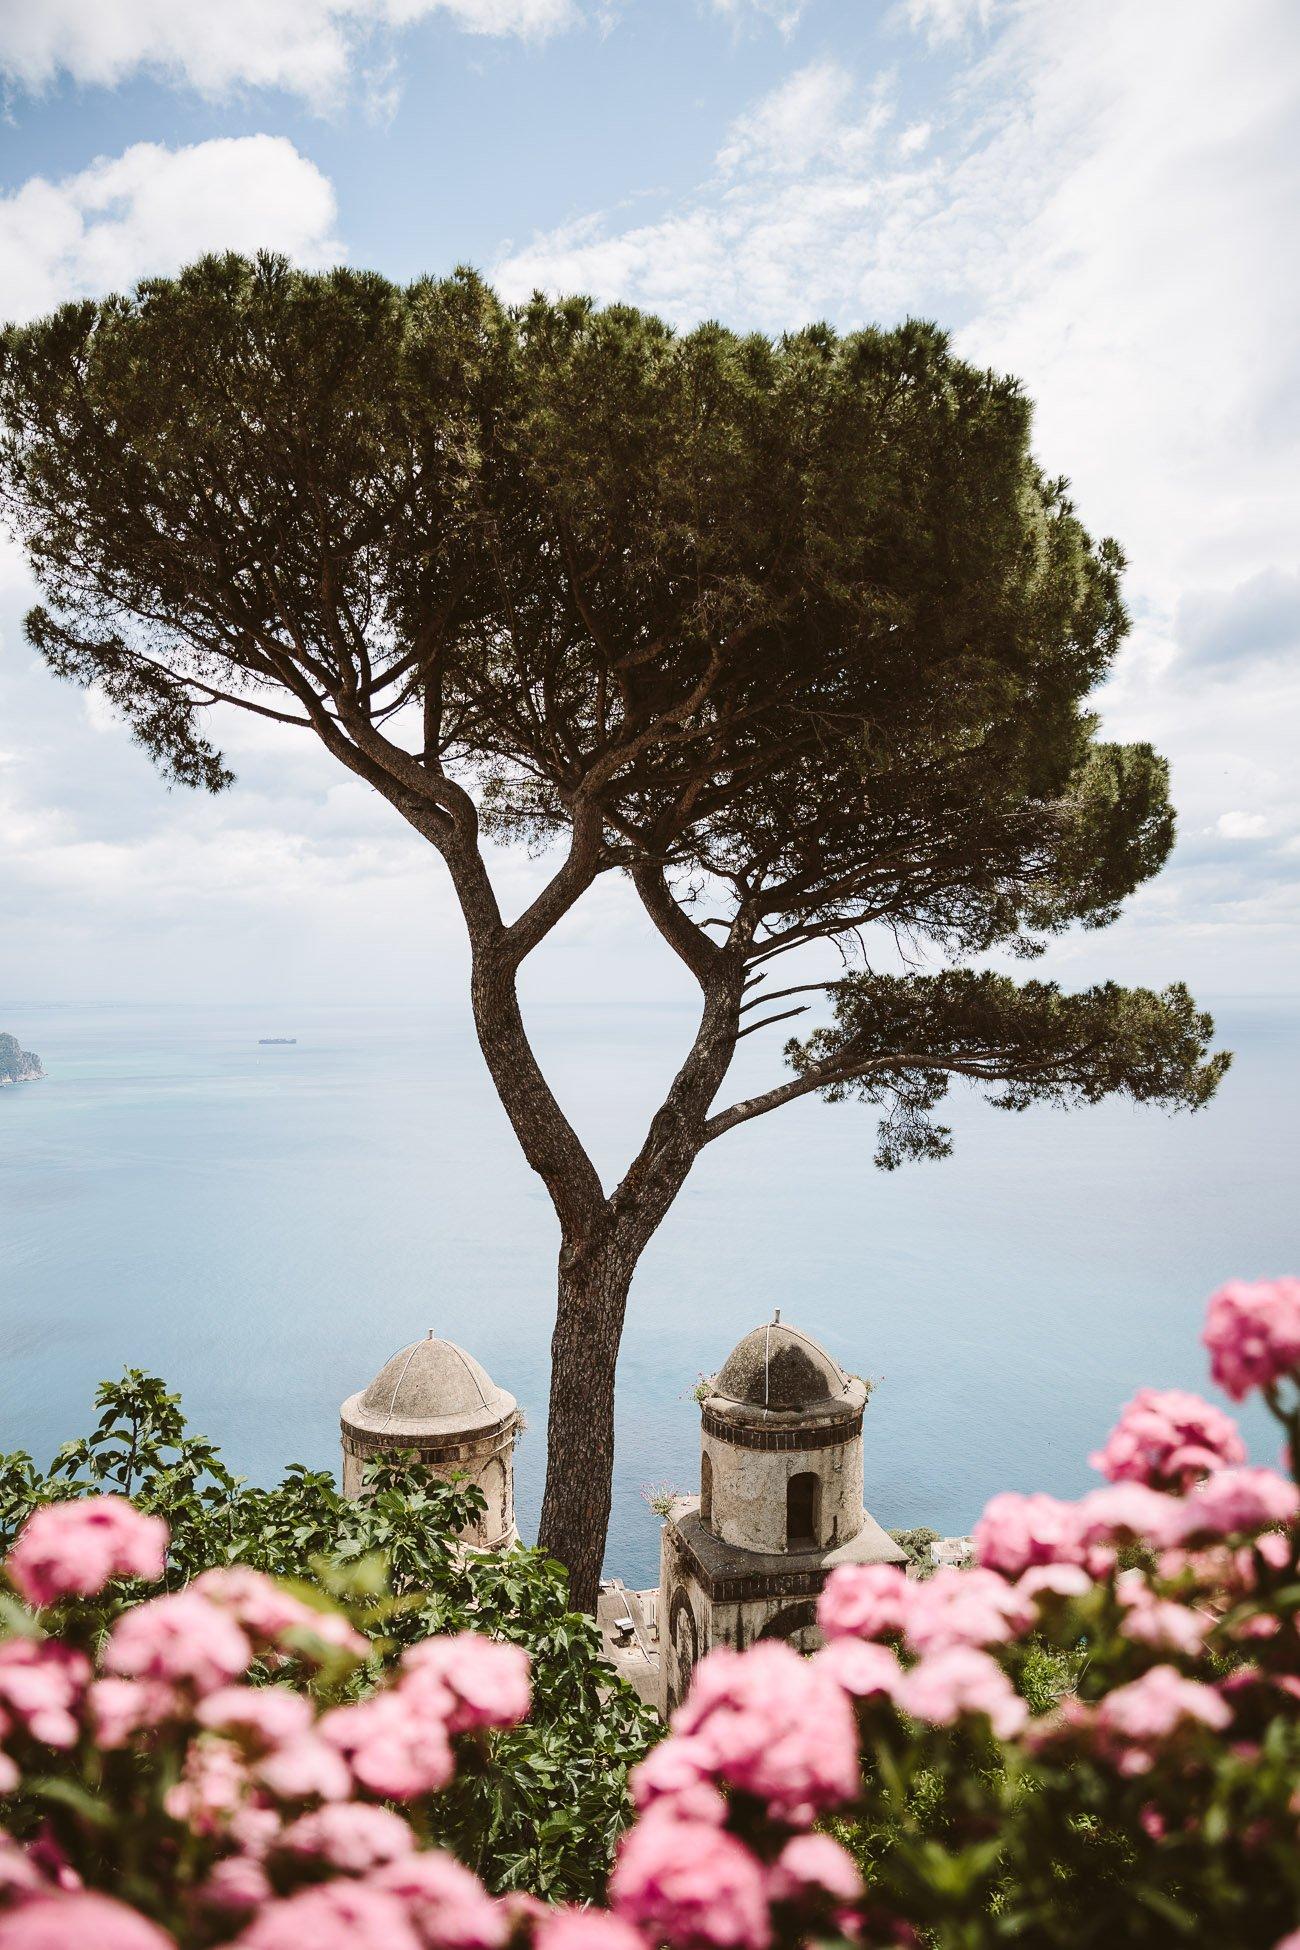 The view from Villa Rufolo in Ravello Amalfi Coast